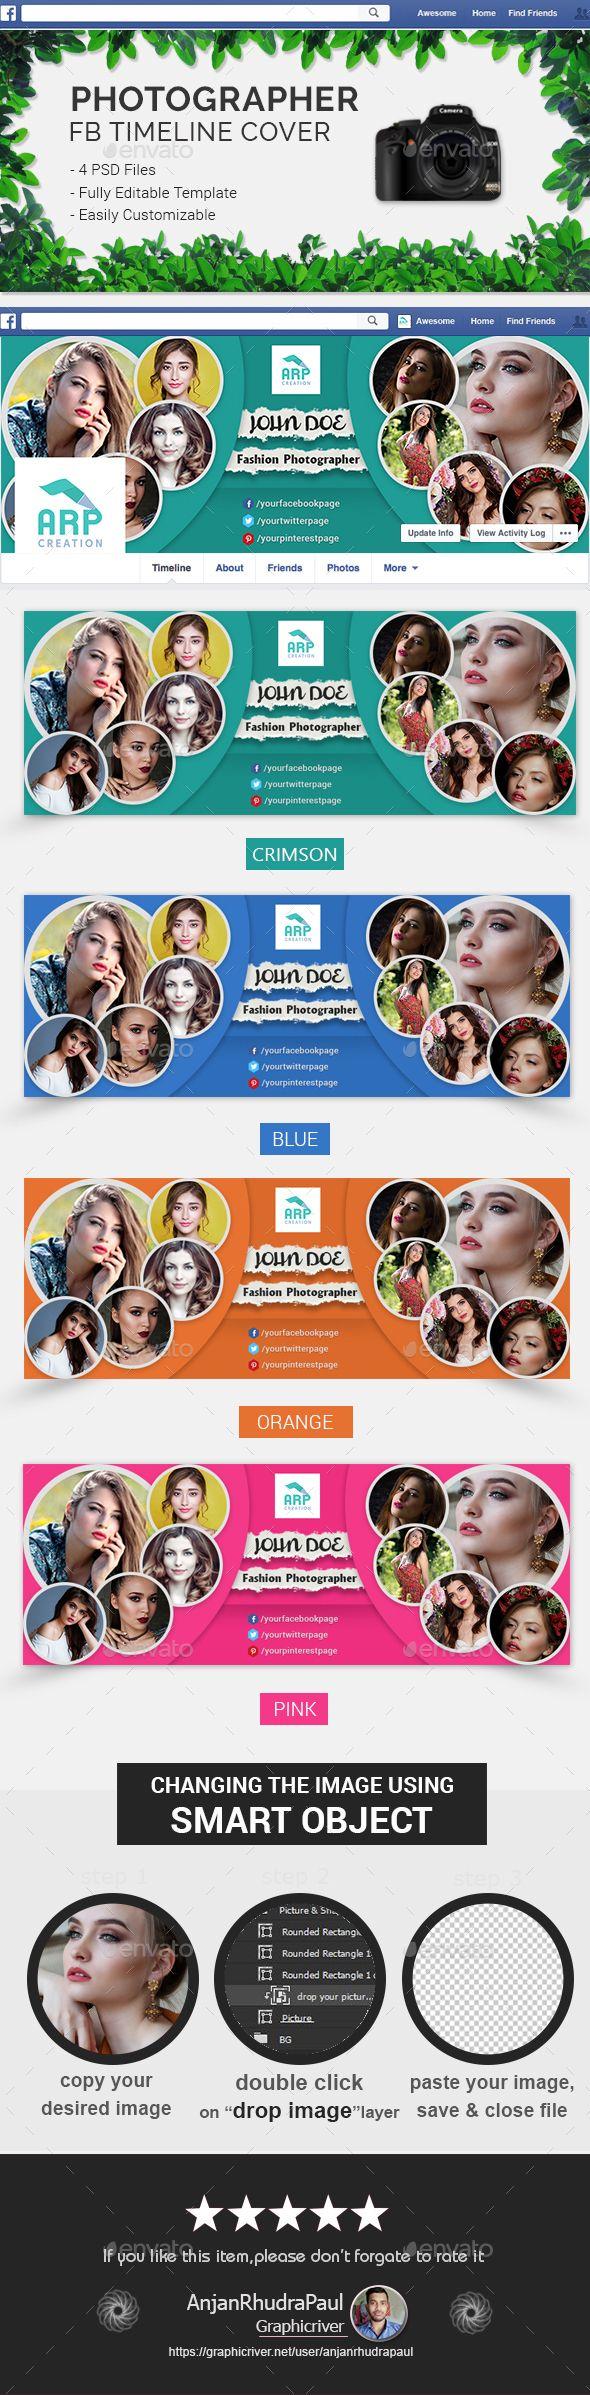 Photographer #FB Timeline Cover - Facebook Timeline Covers #Social Media